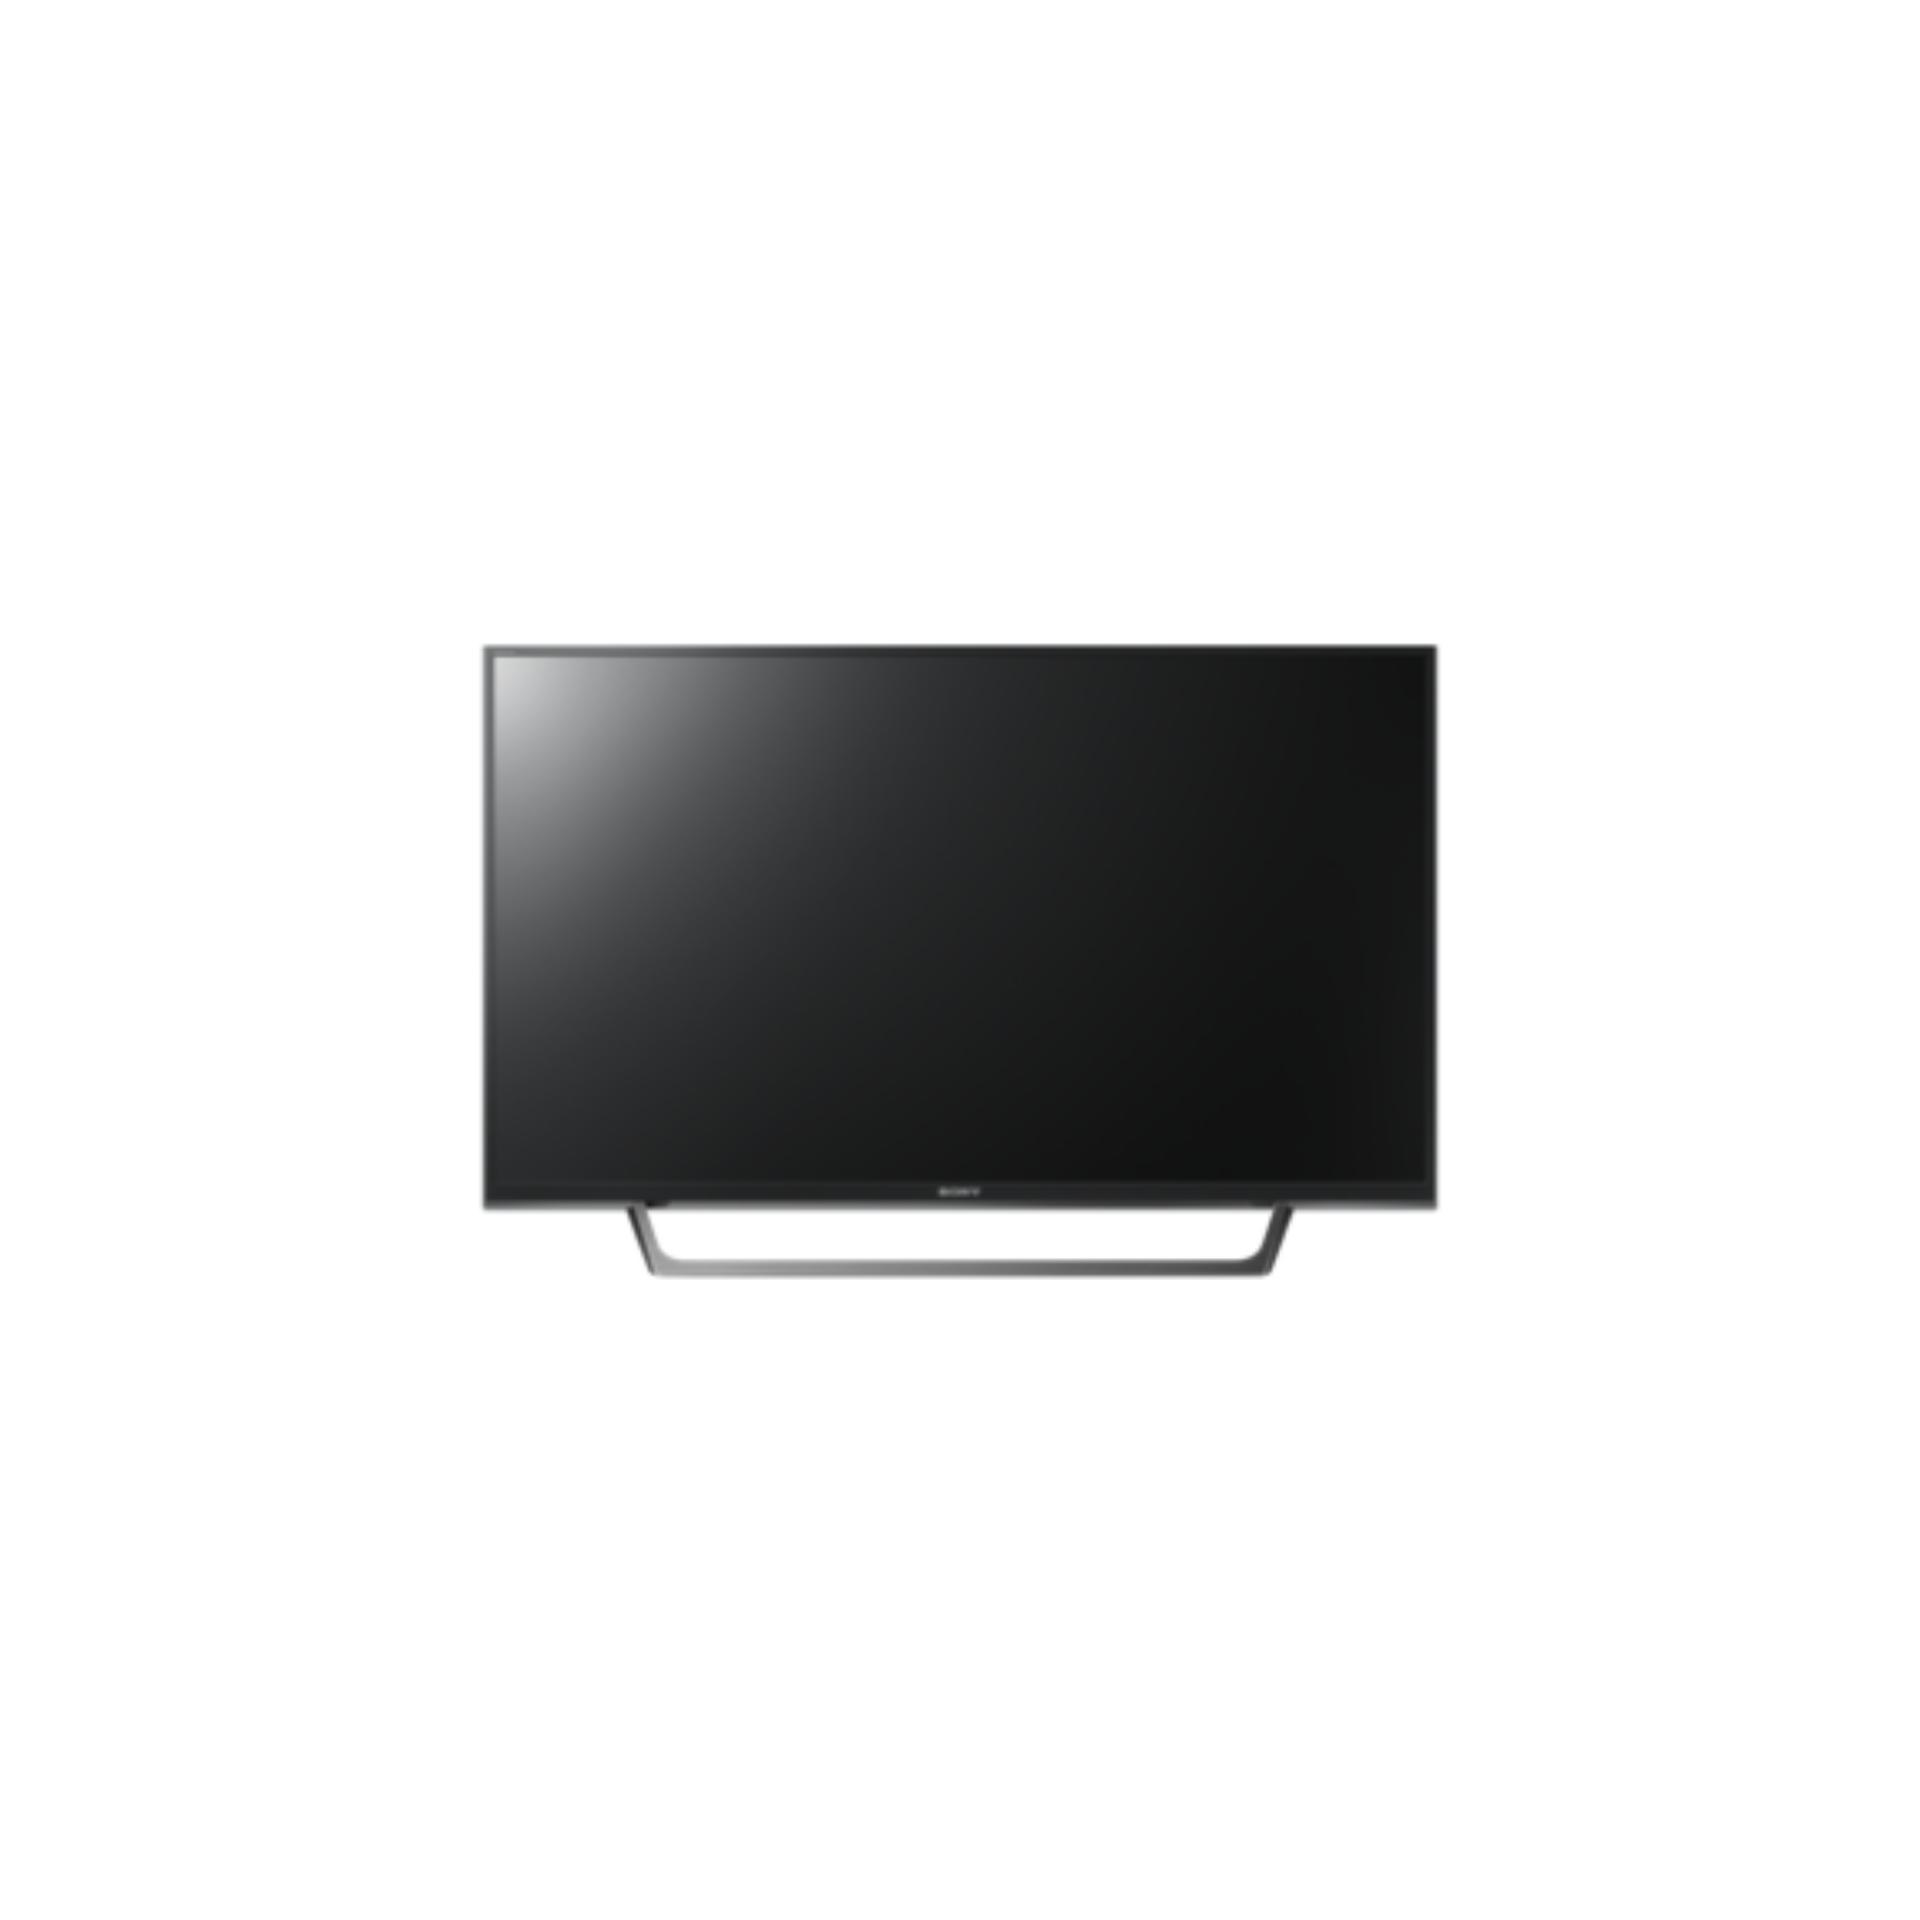 sony tv 32 inch. sony tv 32 inch